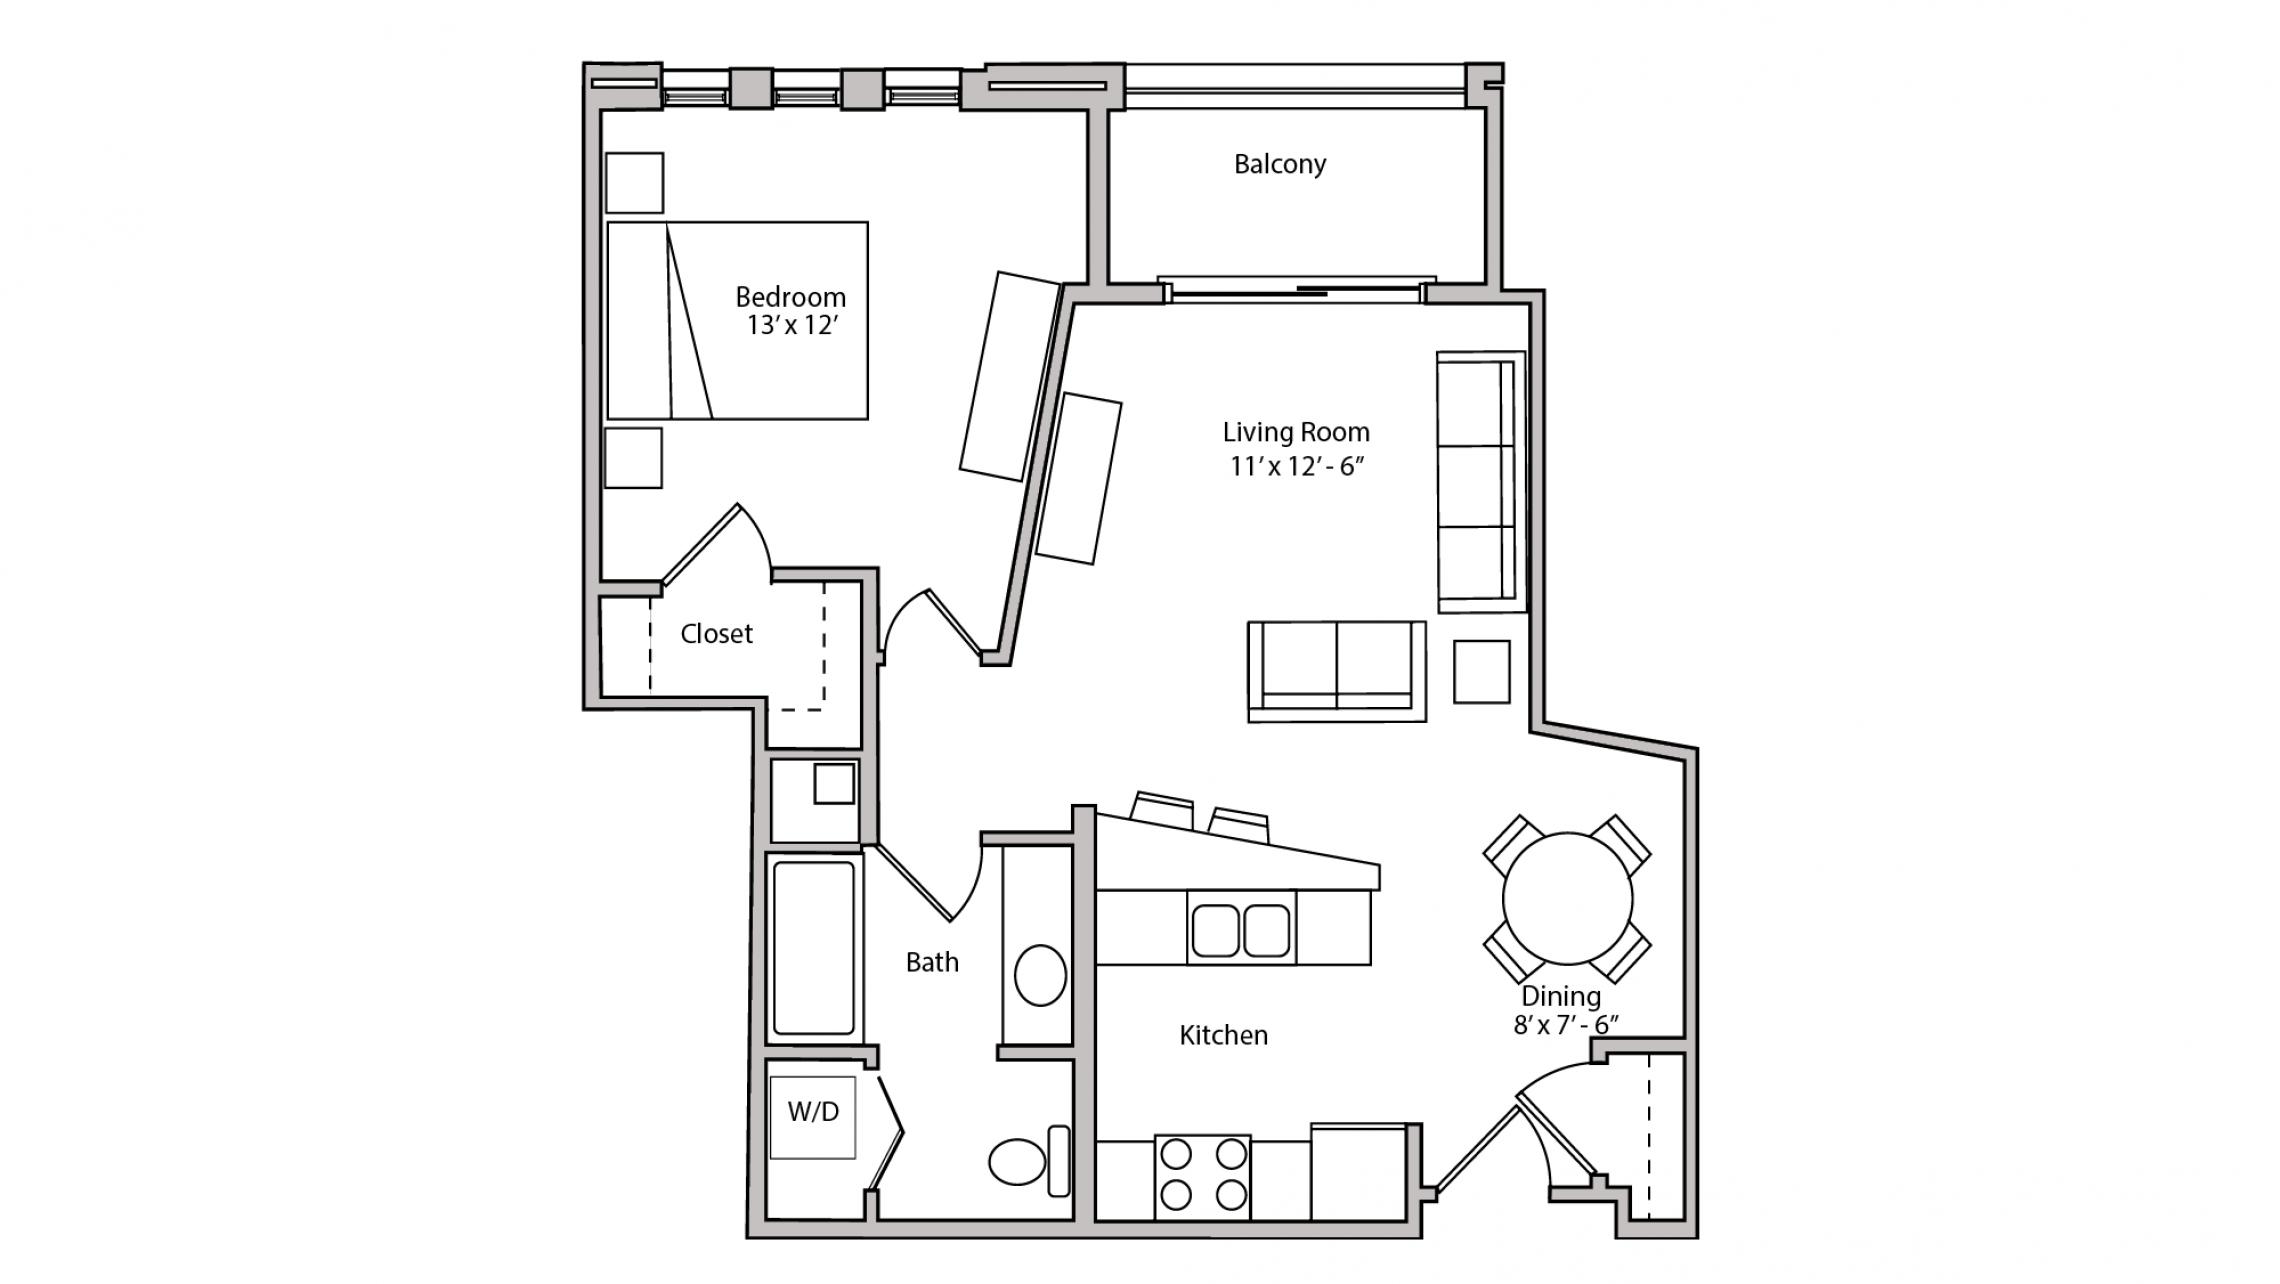 ULI The Depot 1-209 - One Bedroom, One Bathroom